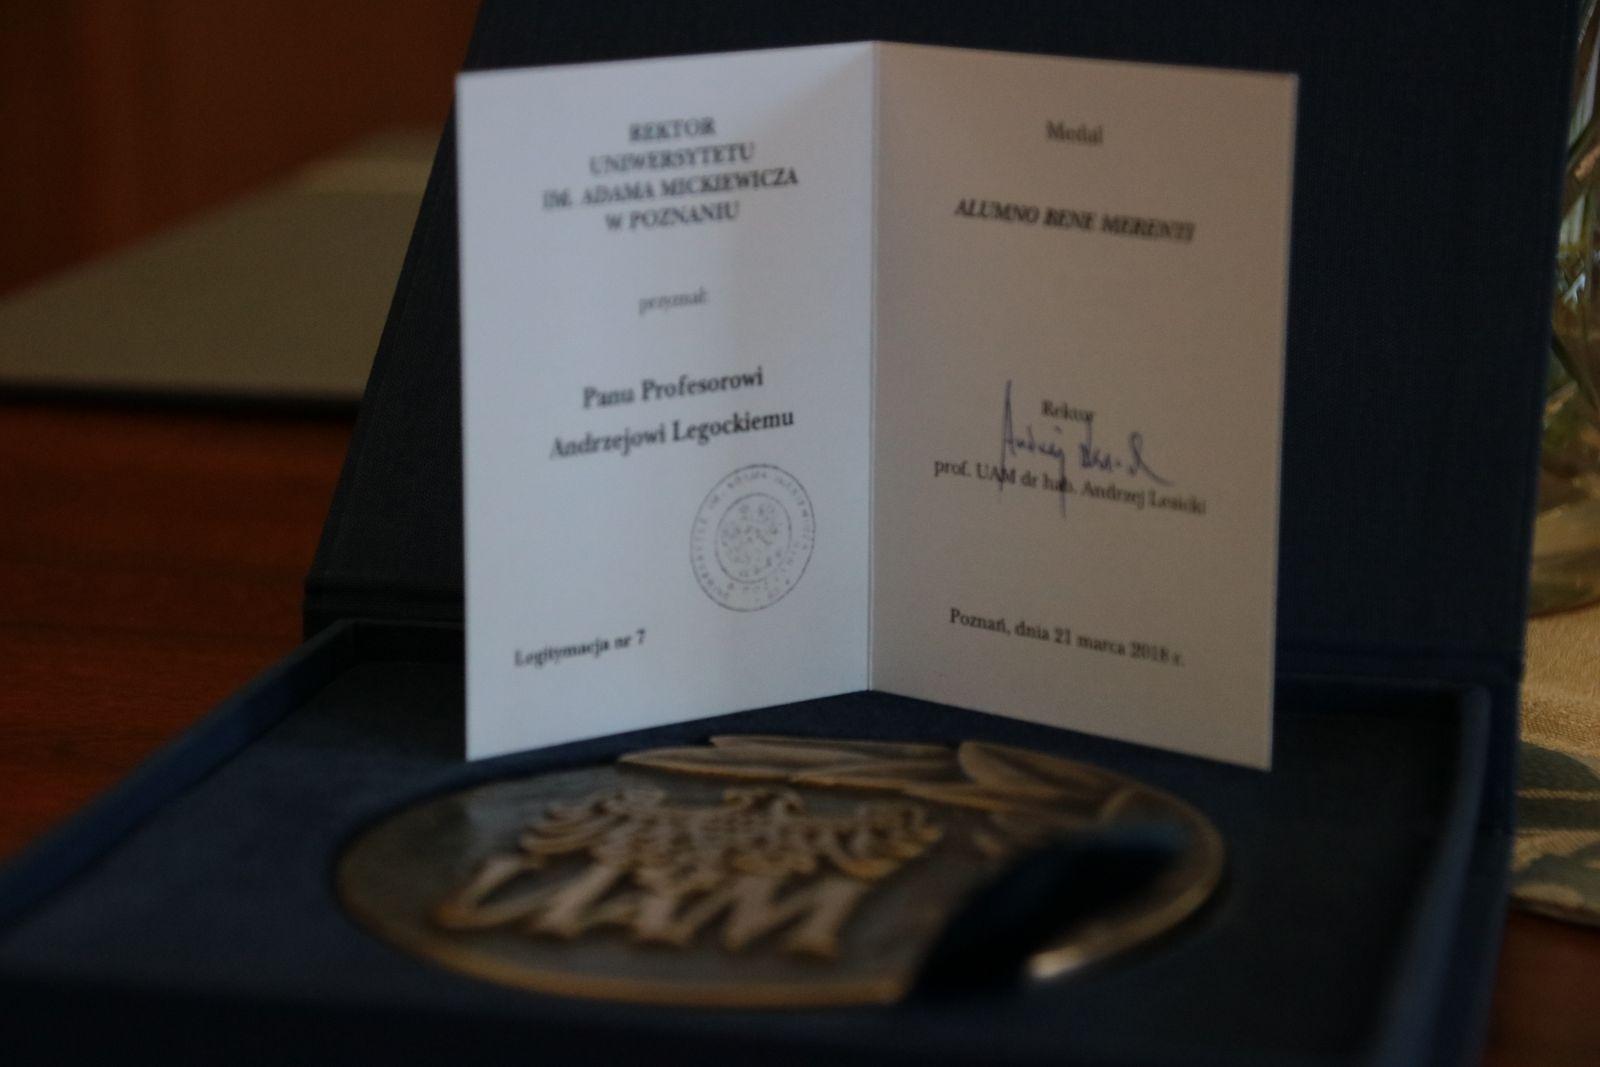 Medal Alumno Bene Merenti dla prof. Andrzeja Legockiego